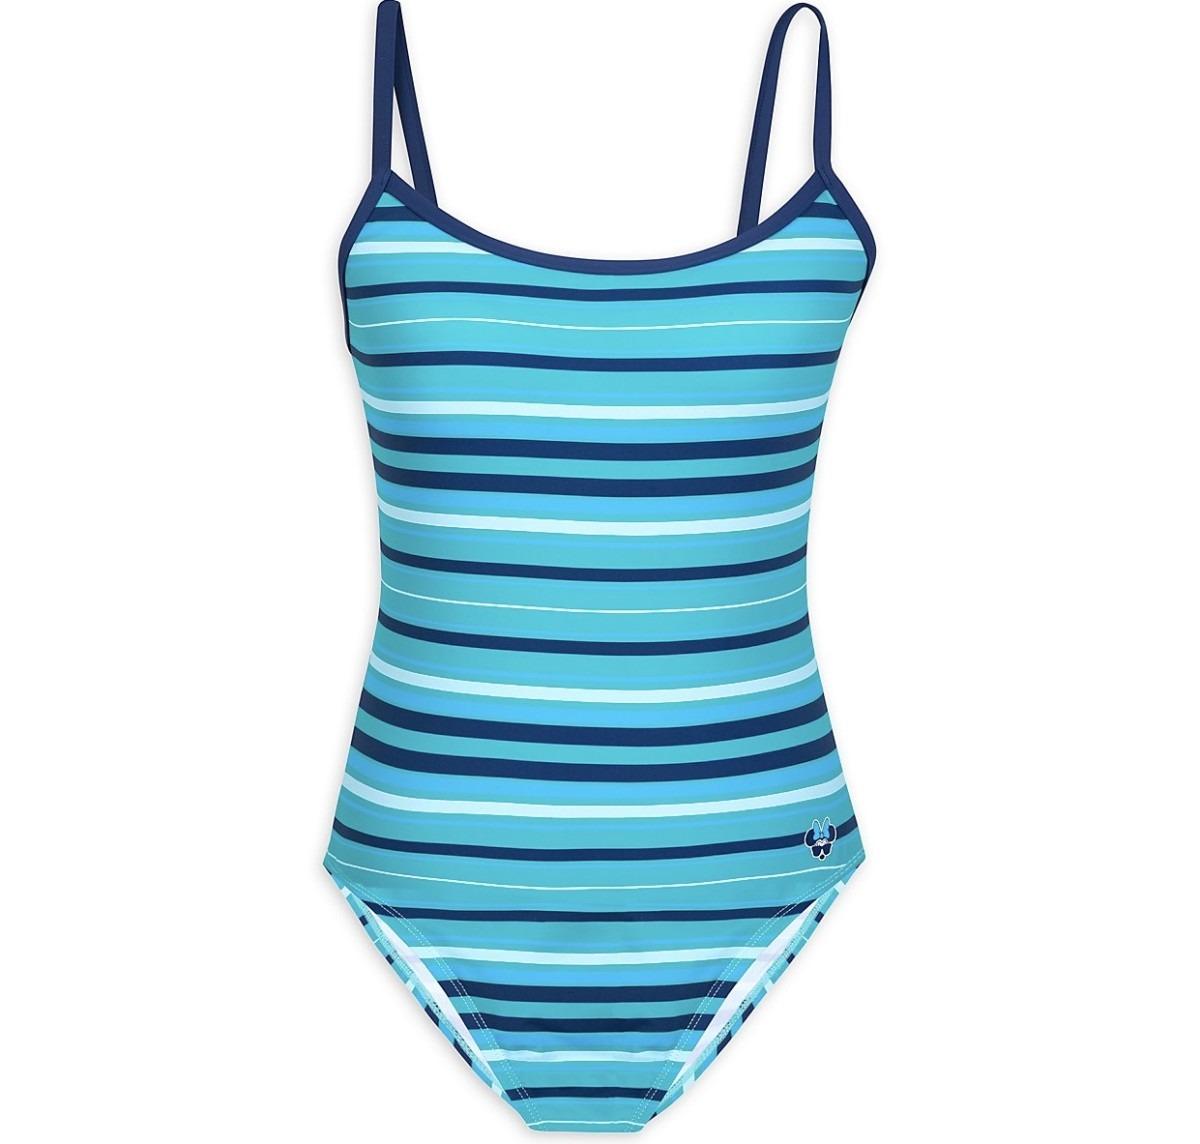 Summer Fun Swim Essentials from shopDisney 6